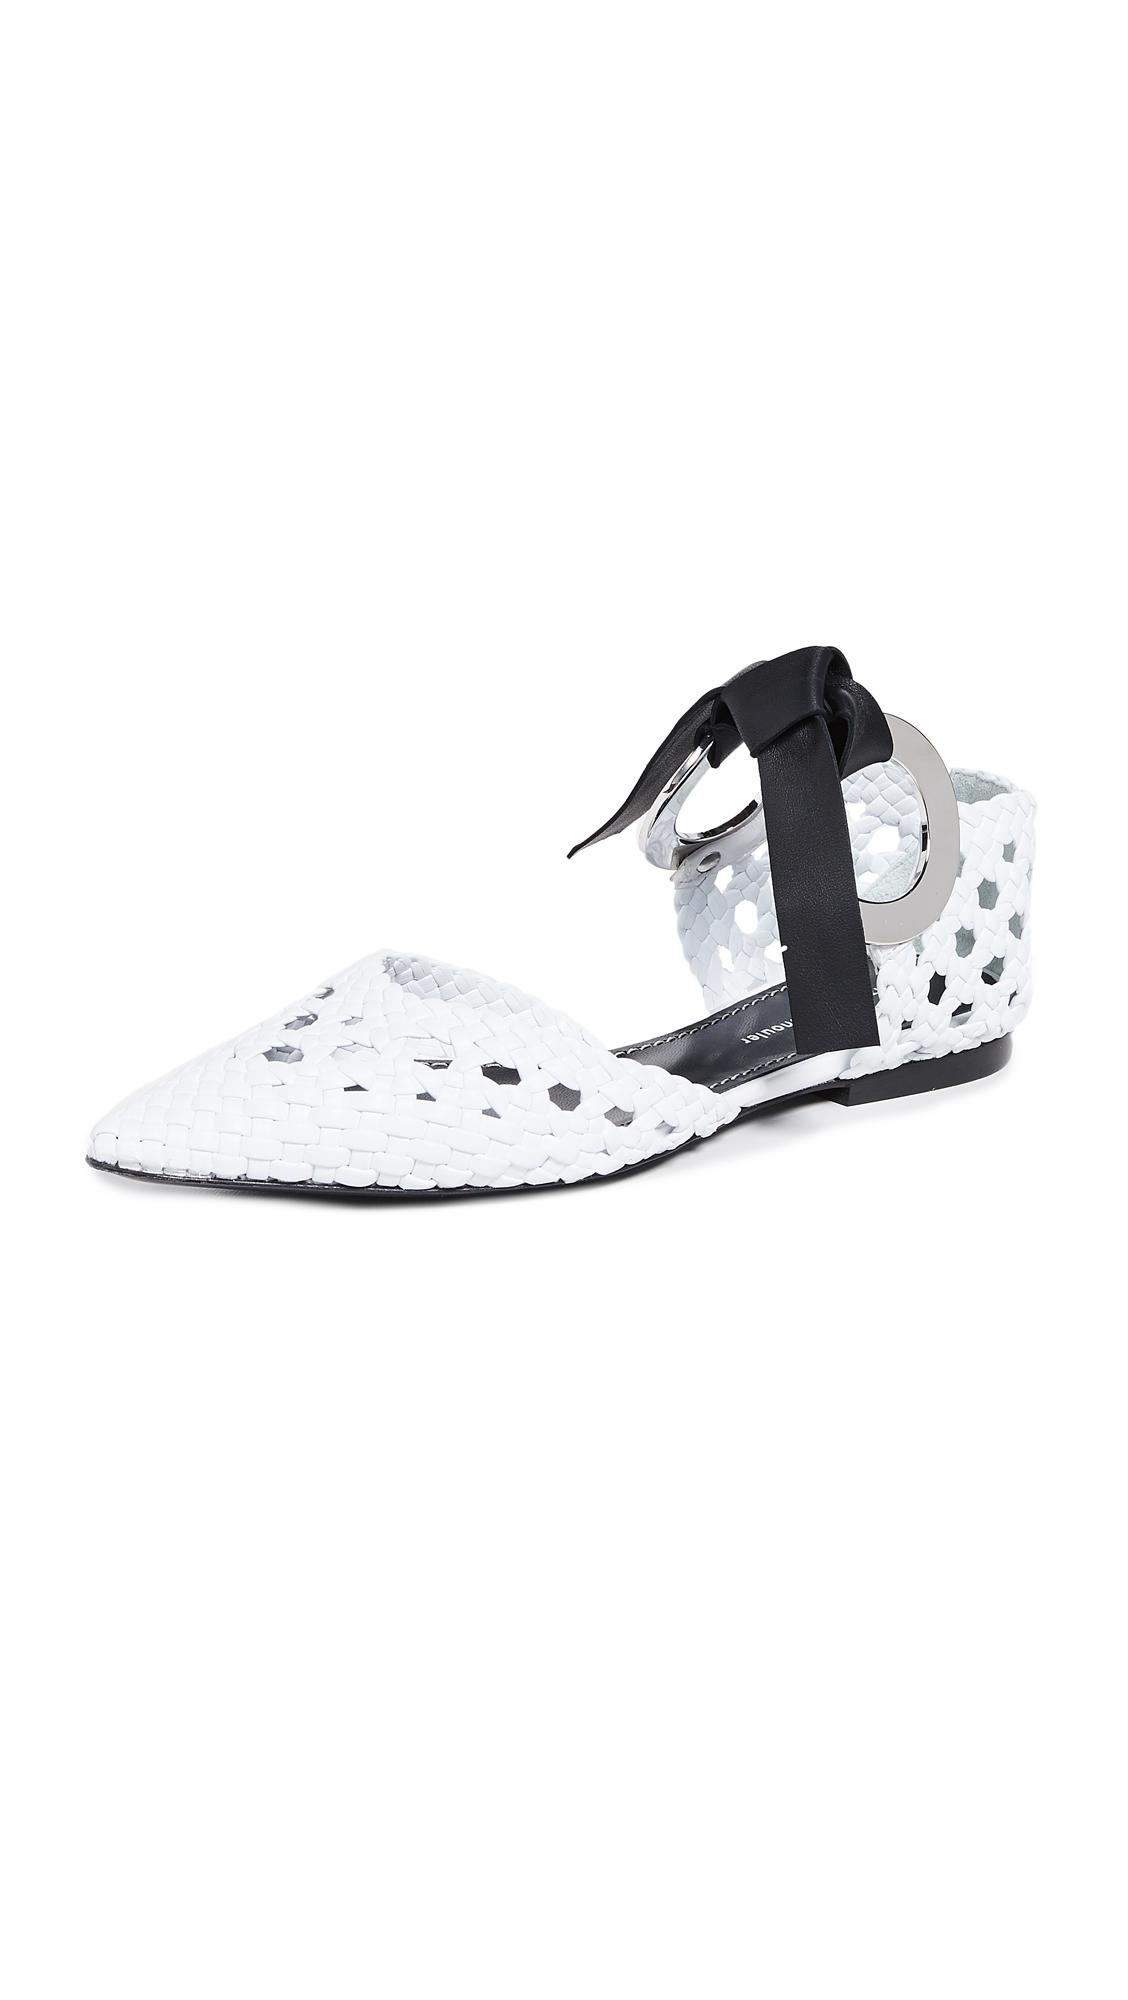 Proenza Schouler Tie Woven Flats - White/Black